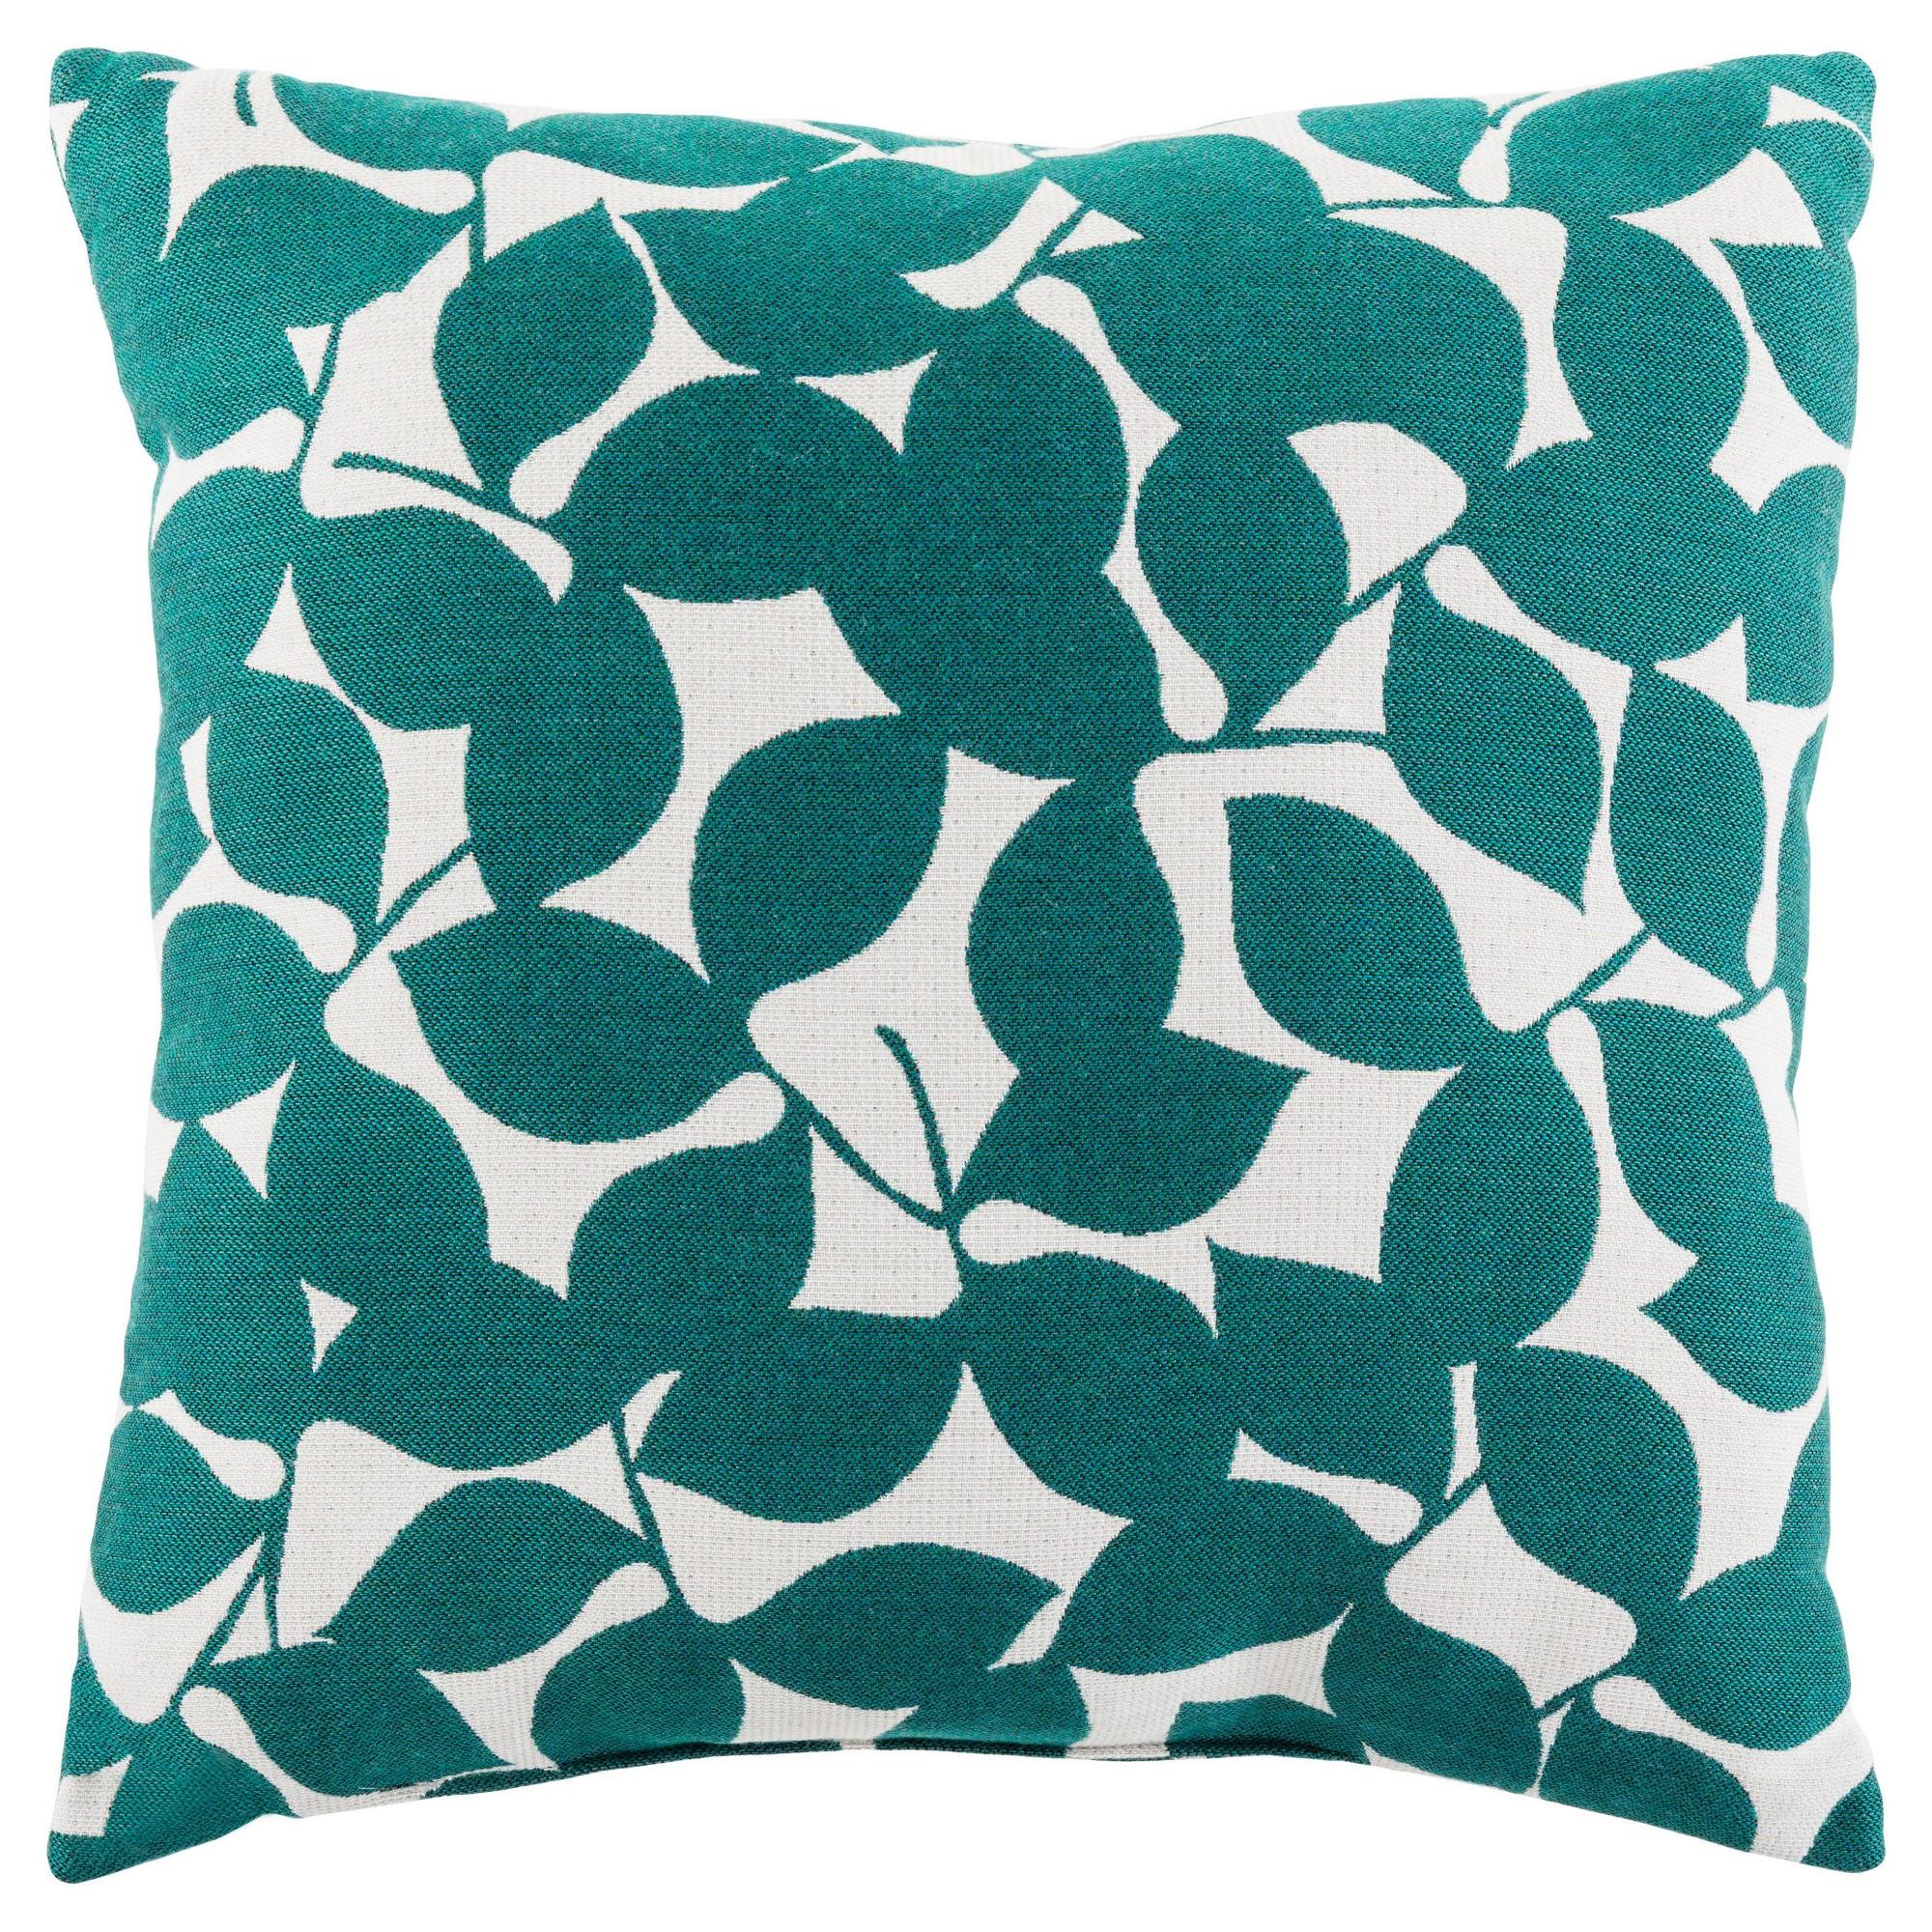 Surya Redding Outdoor Pillow - Teal, Green